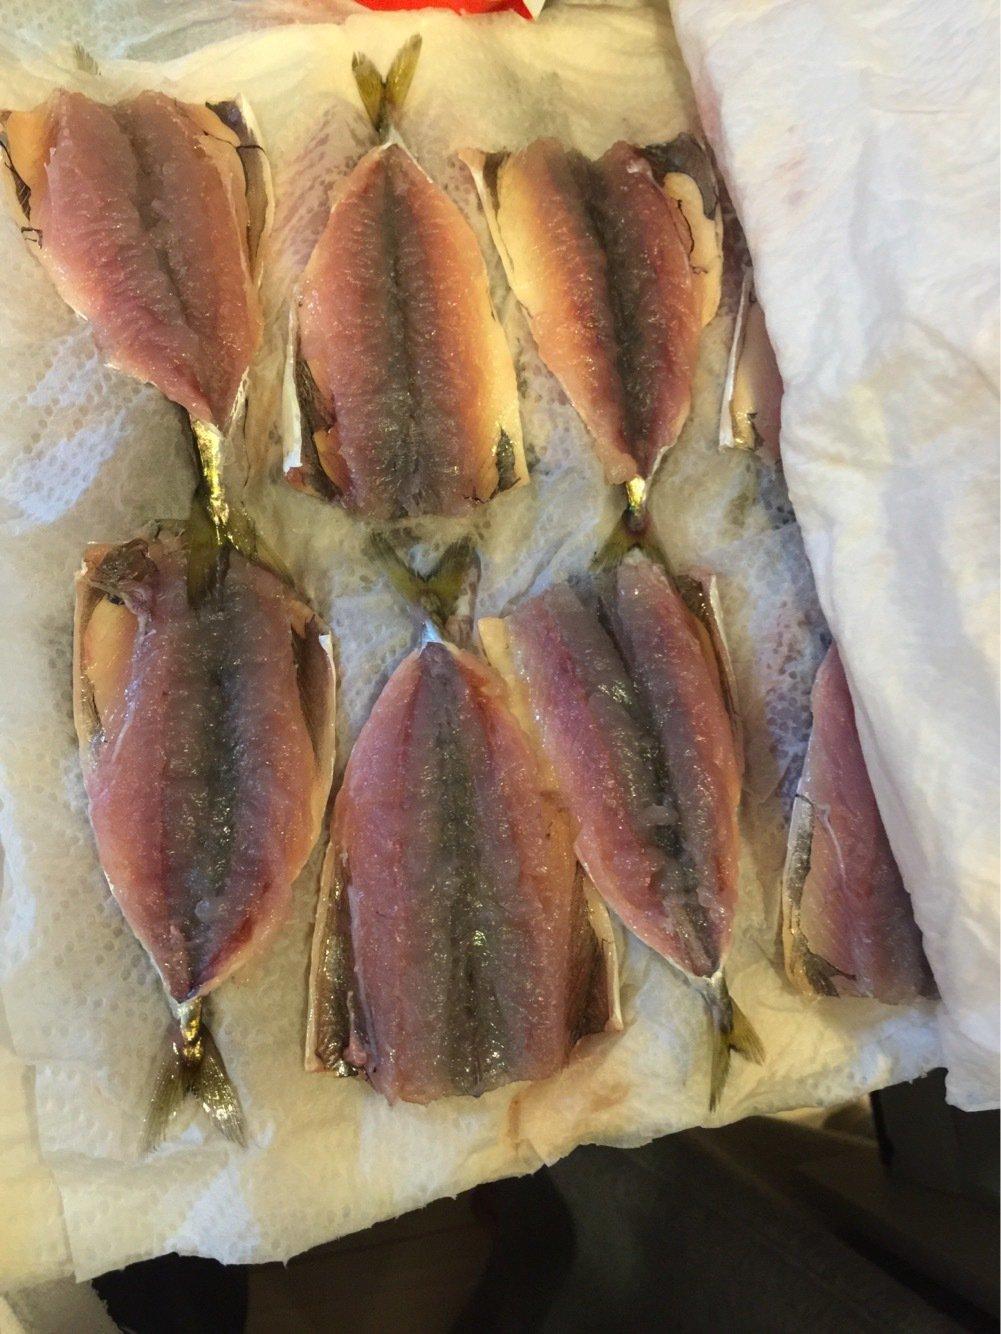 trumpeterhiro さんの投稿画像,写っている魚はゴマサバ